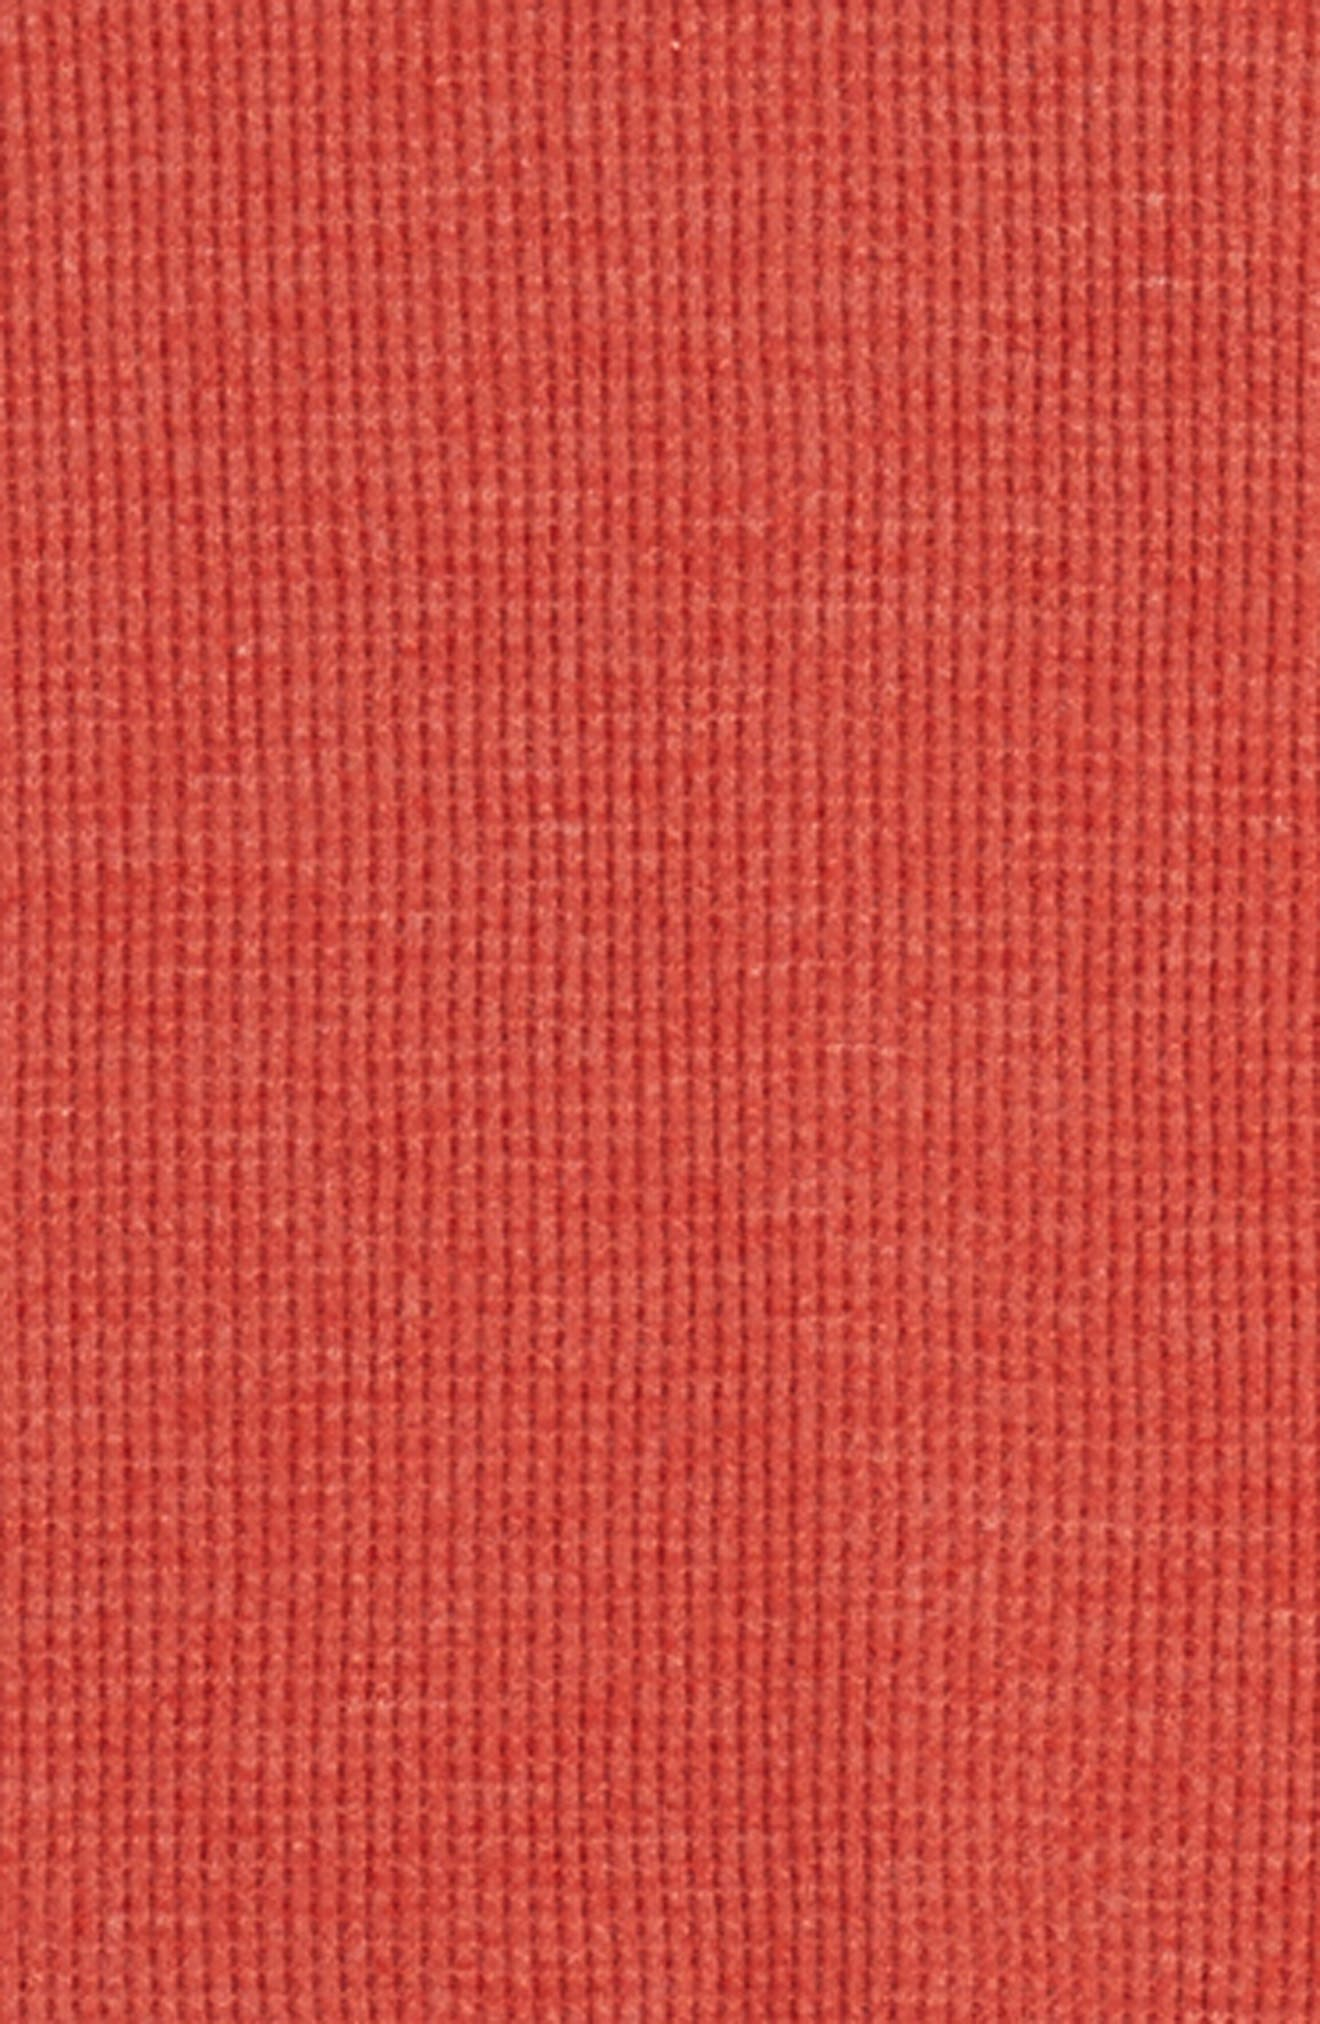 Alternate Image 2  - Tucker + Tate Long Sleeve Thermal T-Shirt (Big Boys)